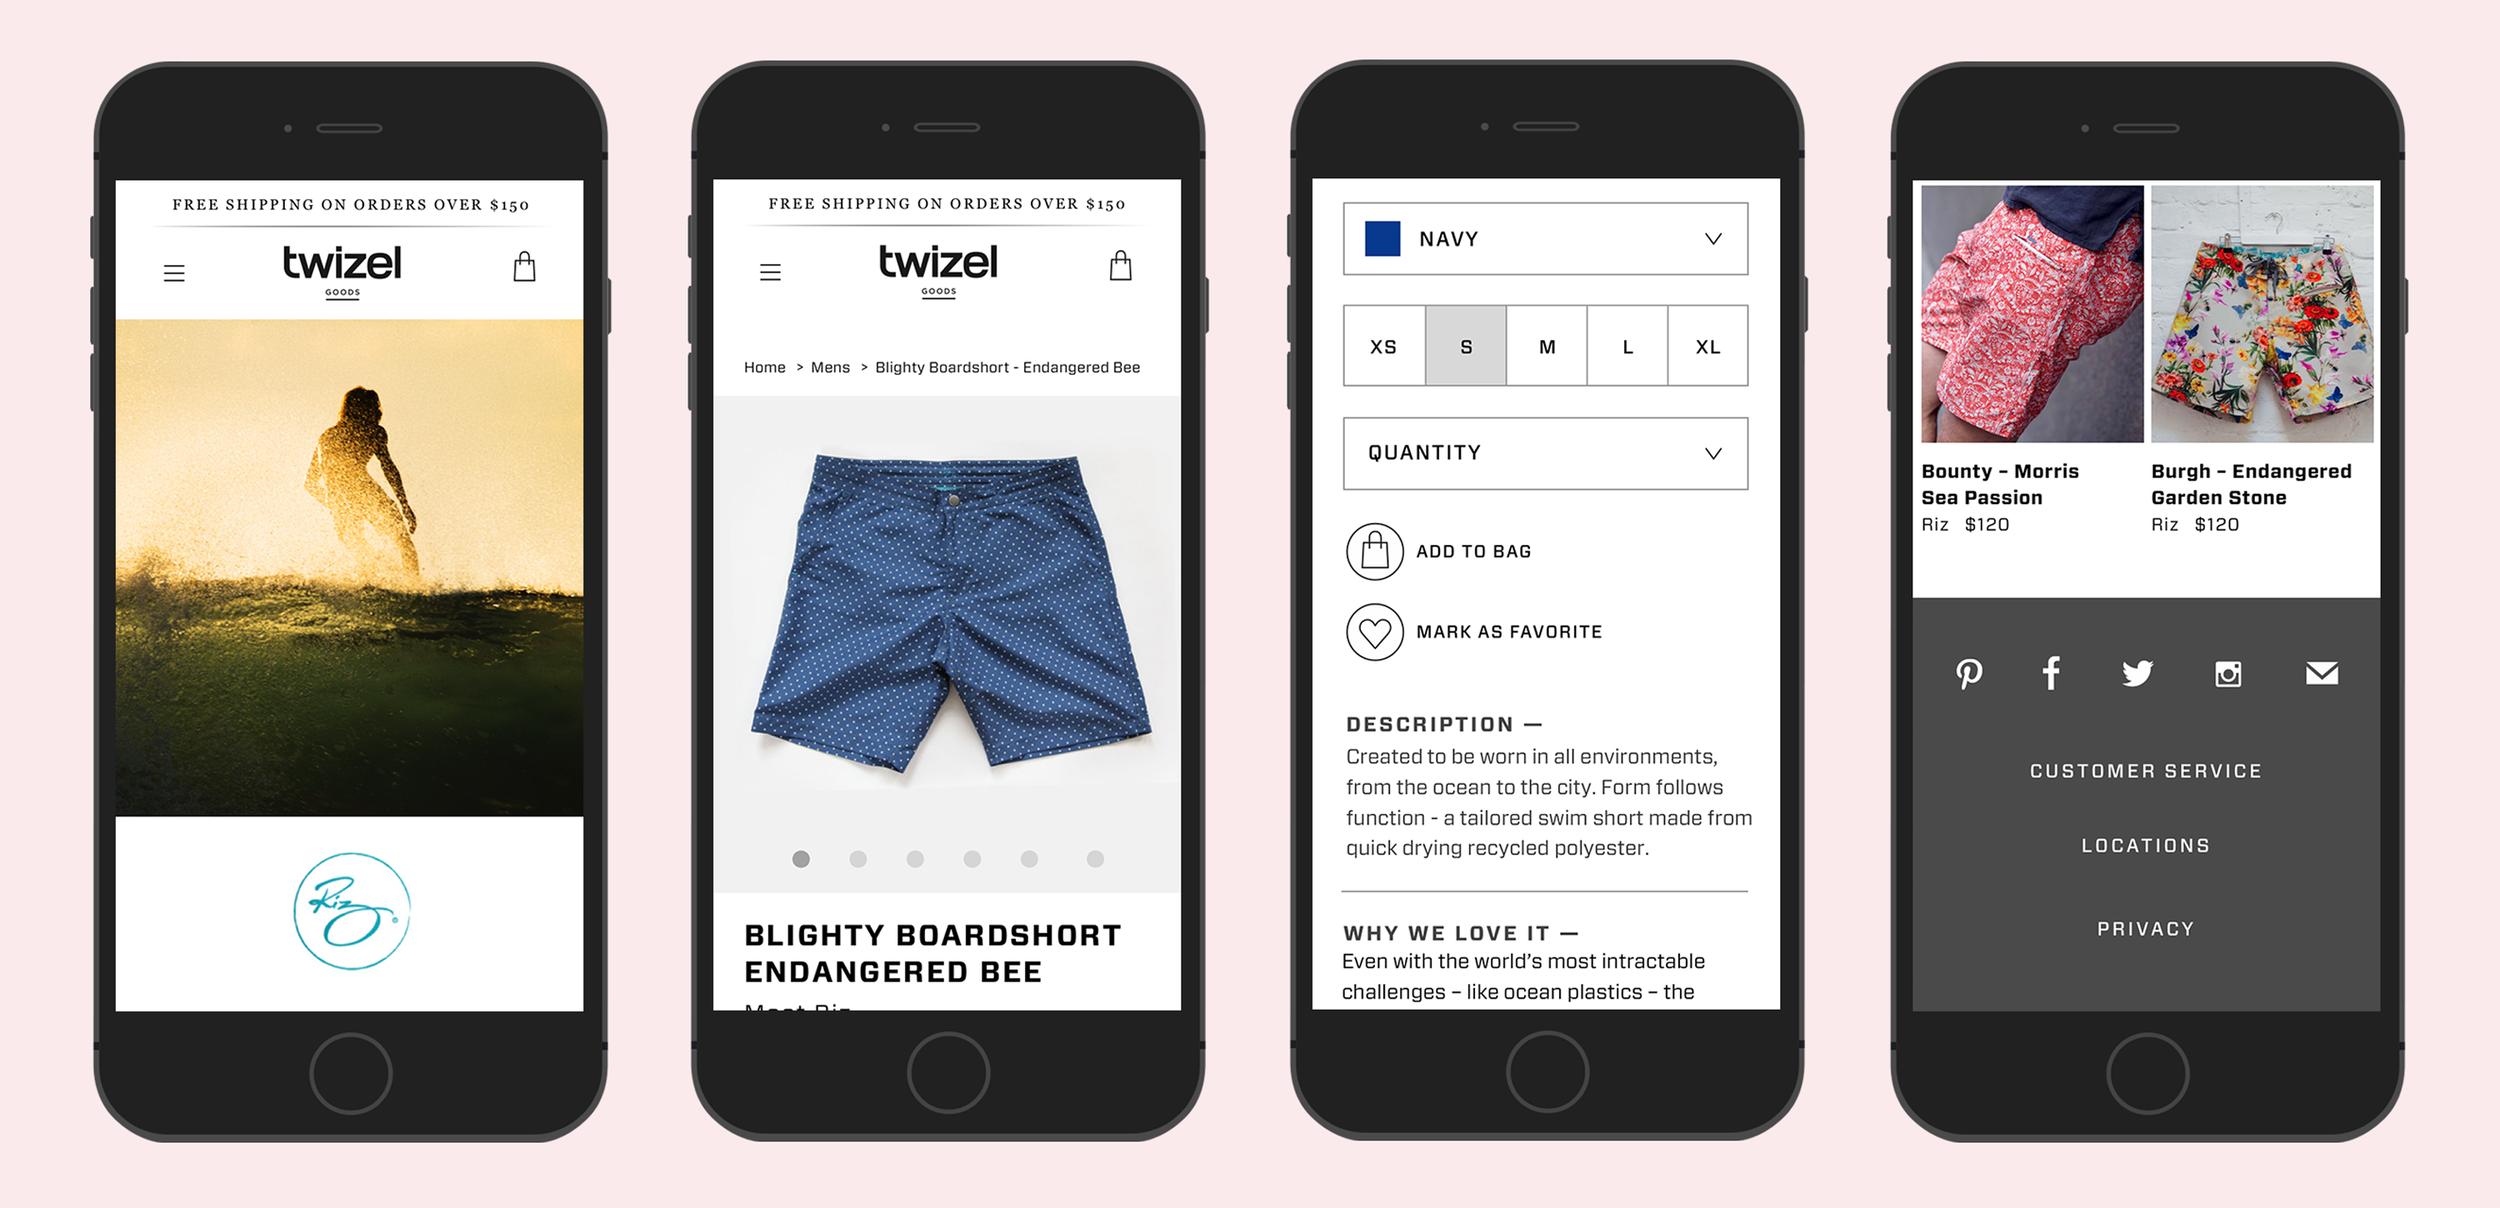 twizel-mobile-screens-3.png